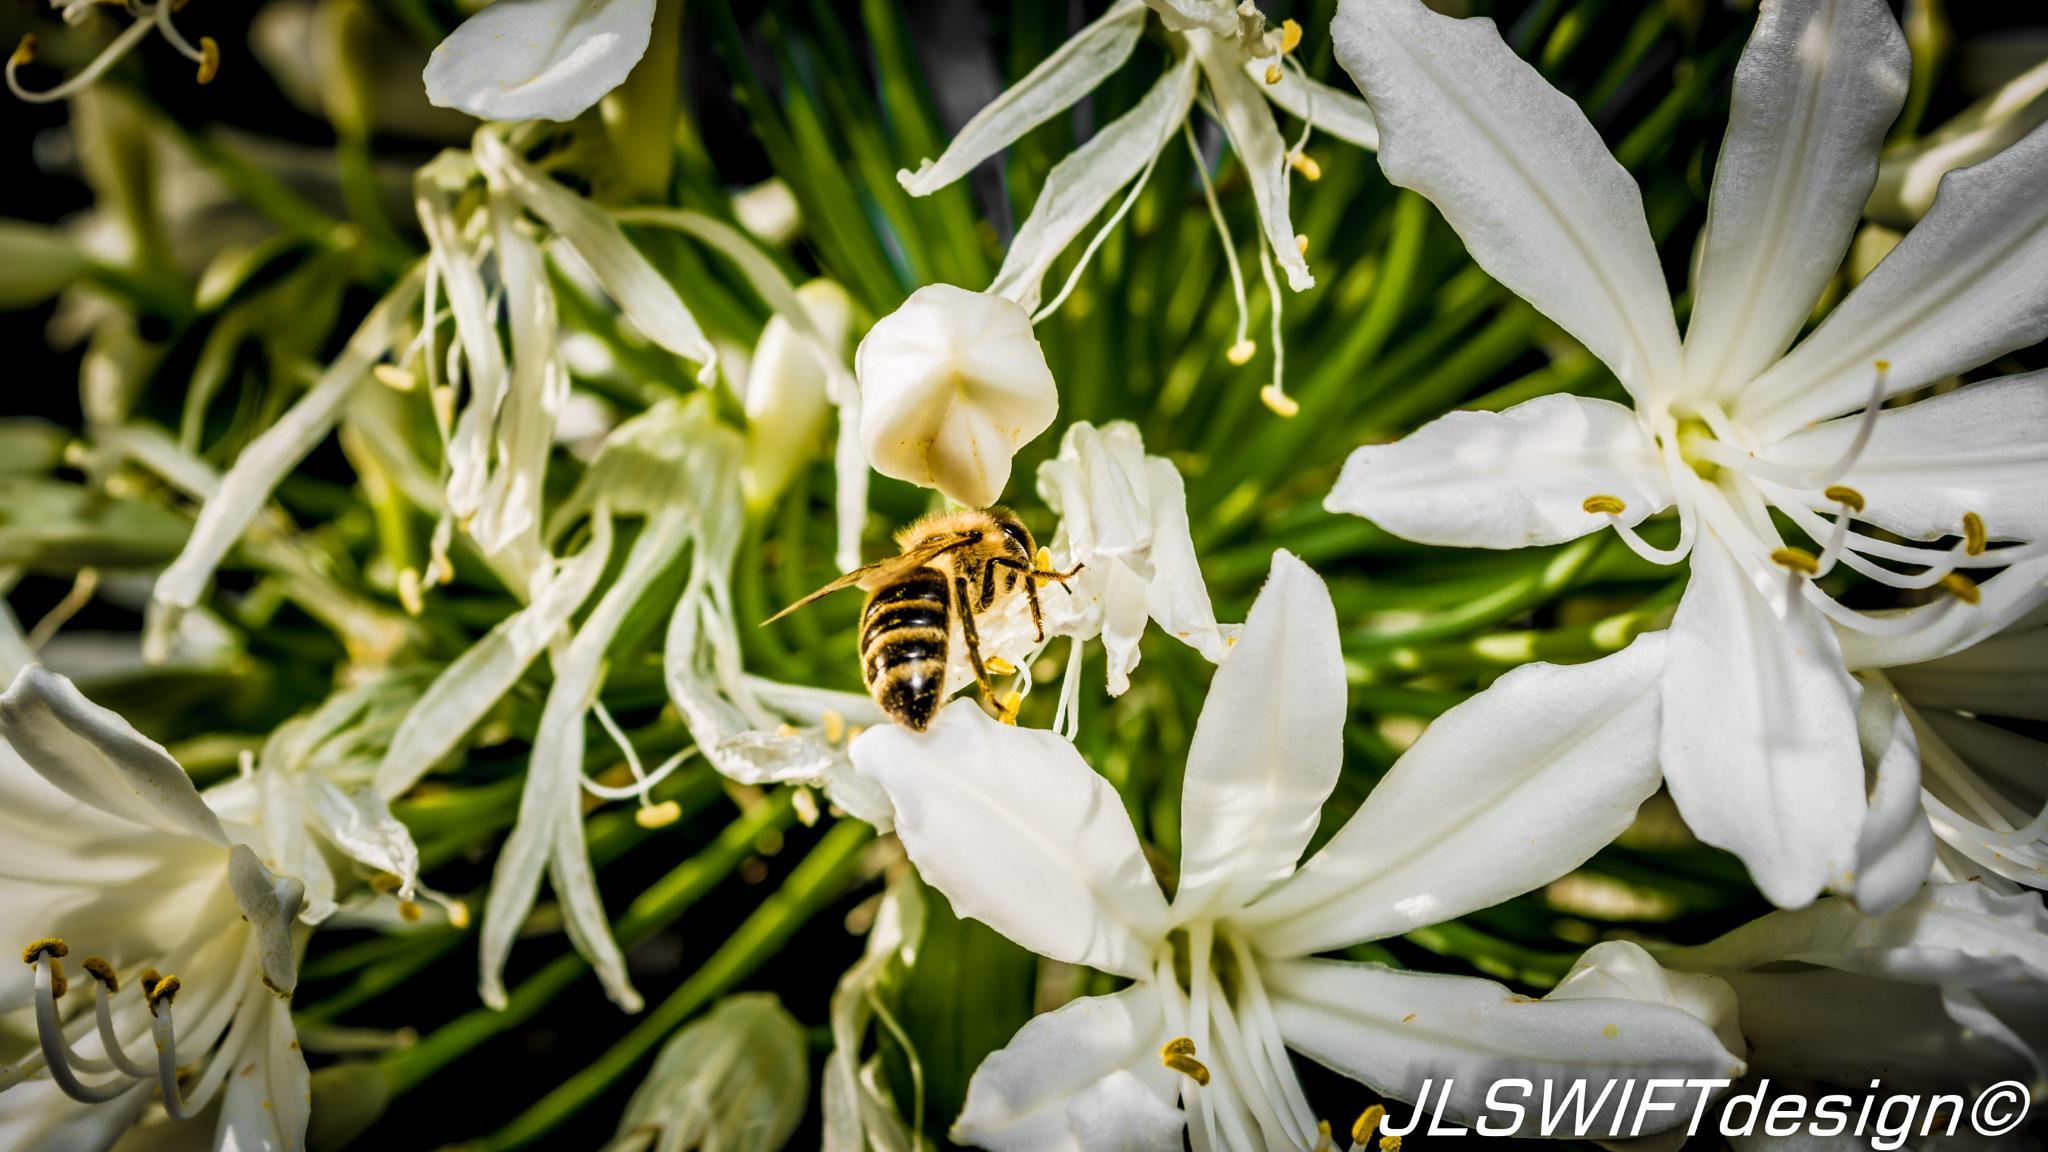 Bees_and_Flower003 photo Jordan Lia JLSWIFTdesign by JLSWIFTdesign